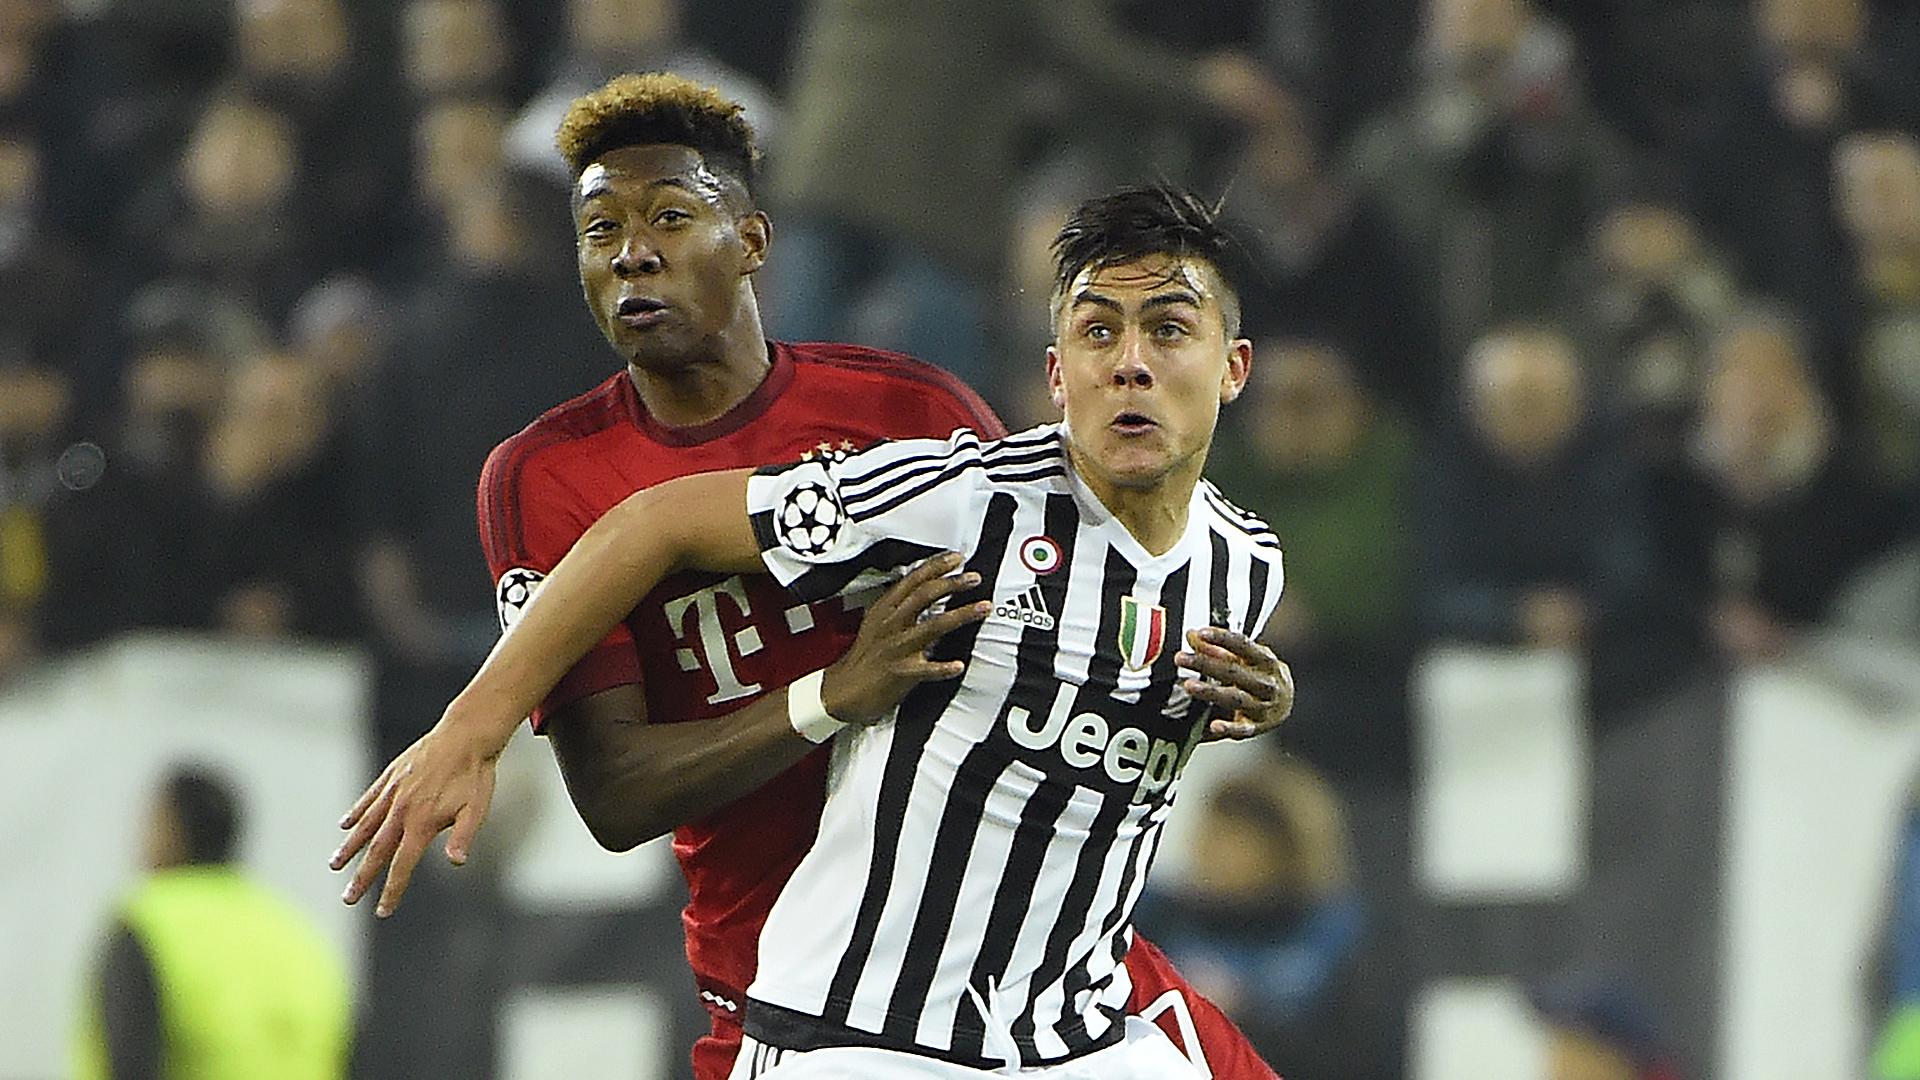 David Alaba Paulo Dybala FC Bayern Juventus Turin 02232016